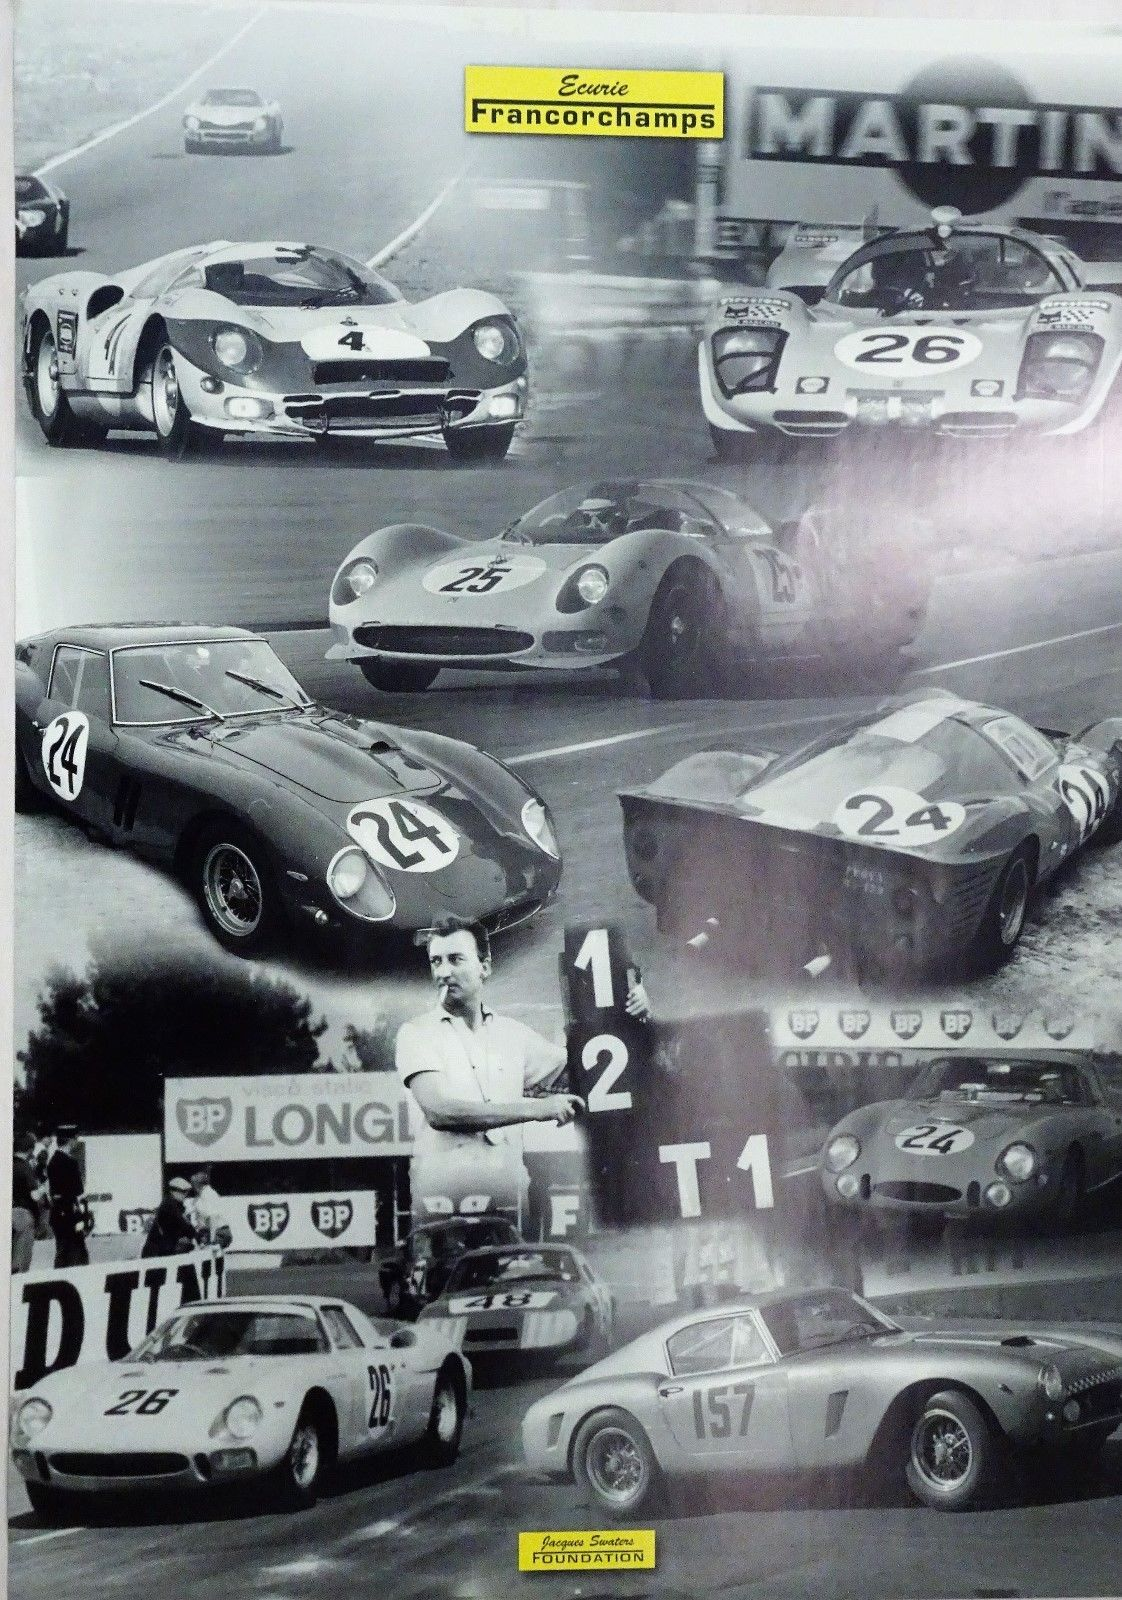 Ecurie Francorchamps Ferrari Poster 2